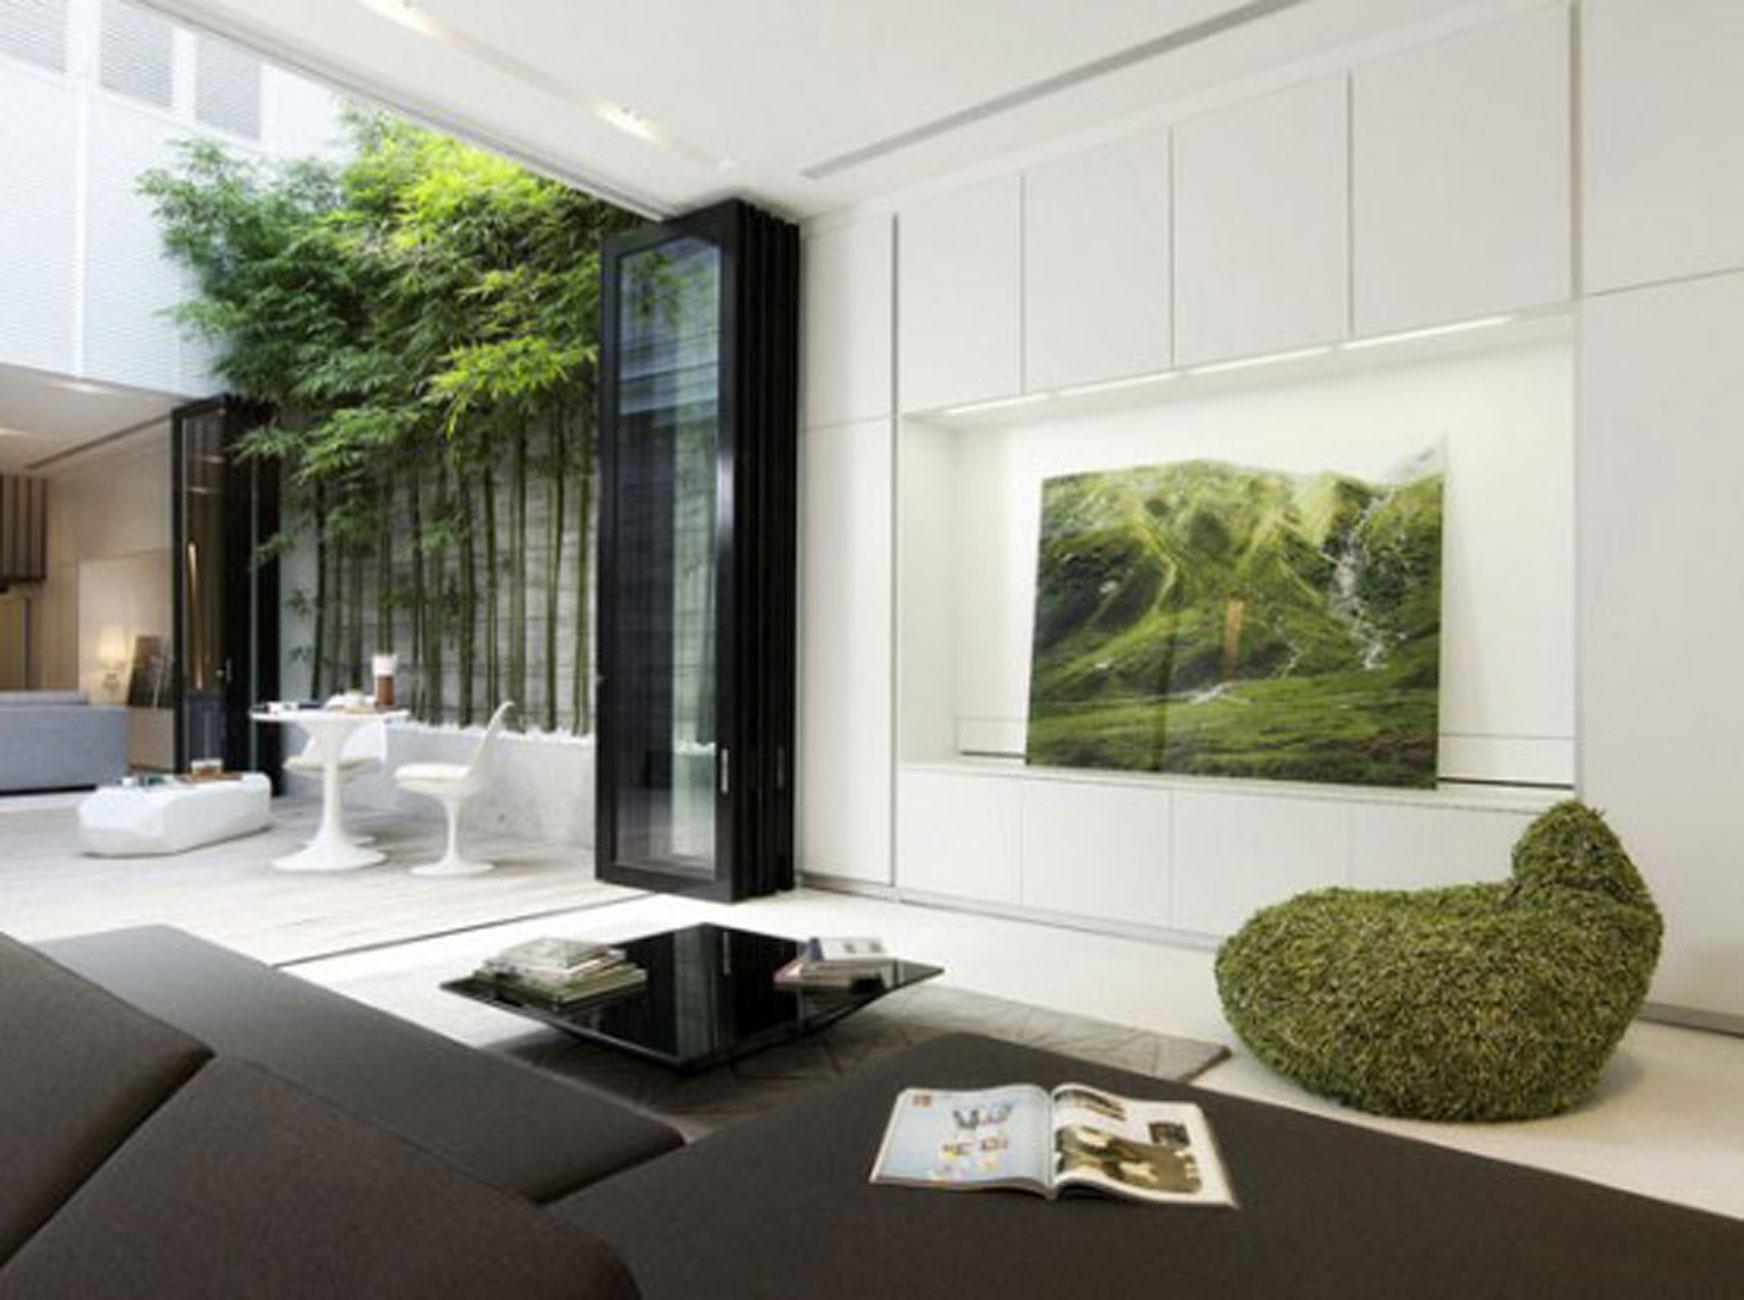 Dreen Living Area Modern Coastal Home Designs (Image 3 of 10)